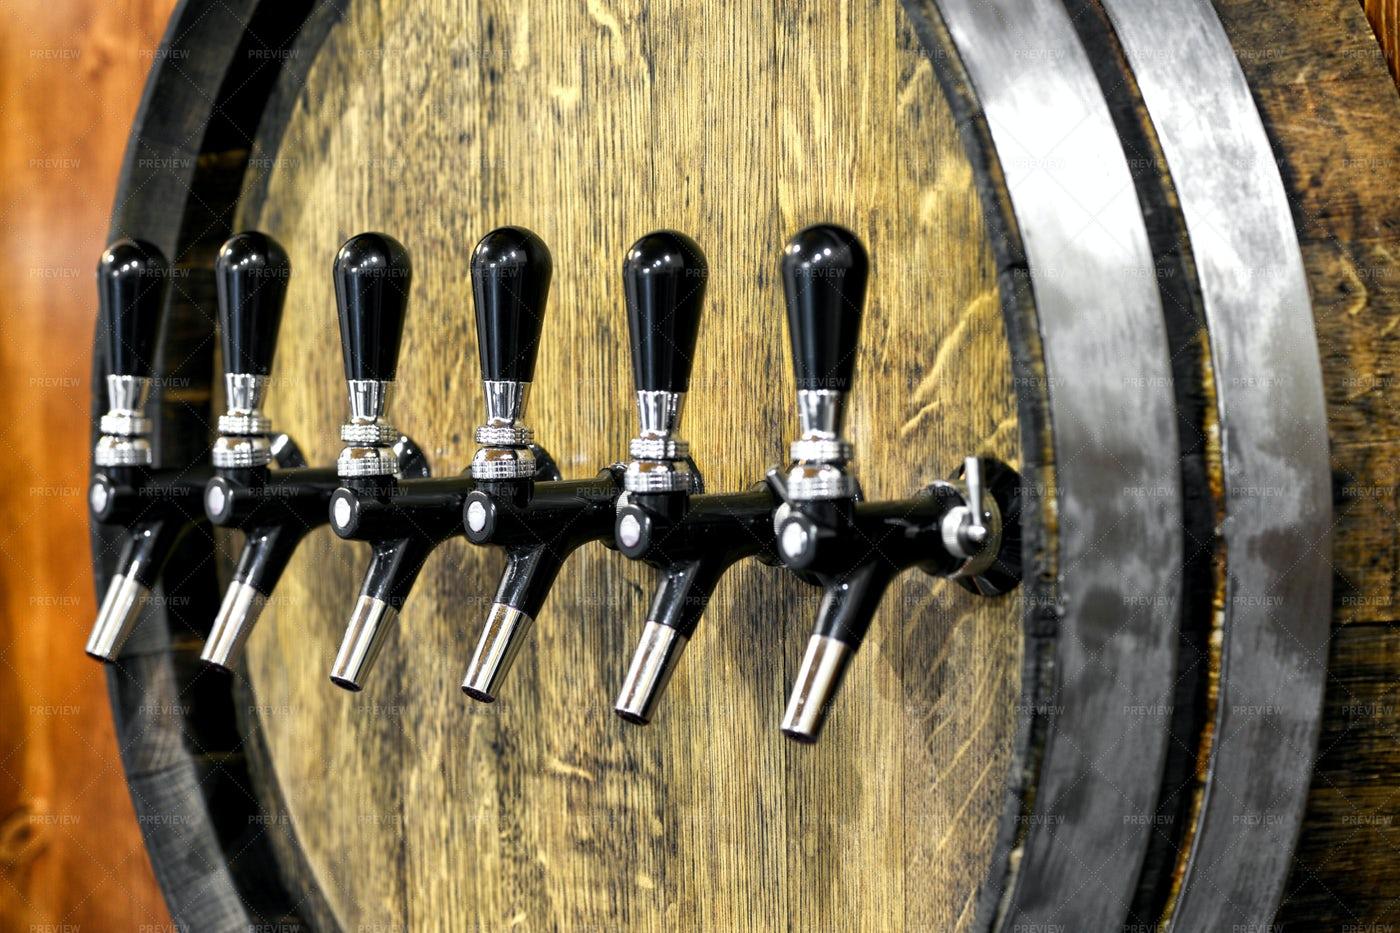 Large Oak Wine Barrel: Stock Photos